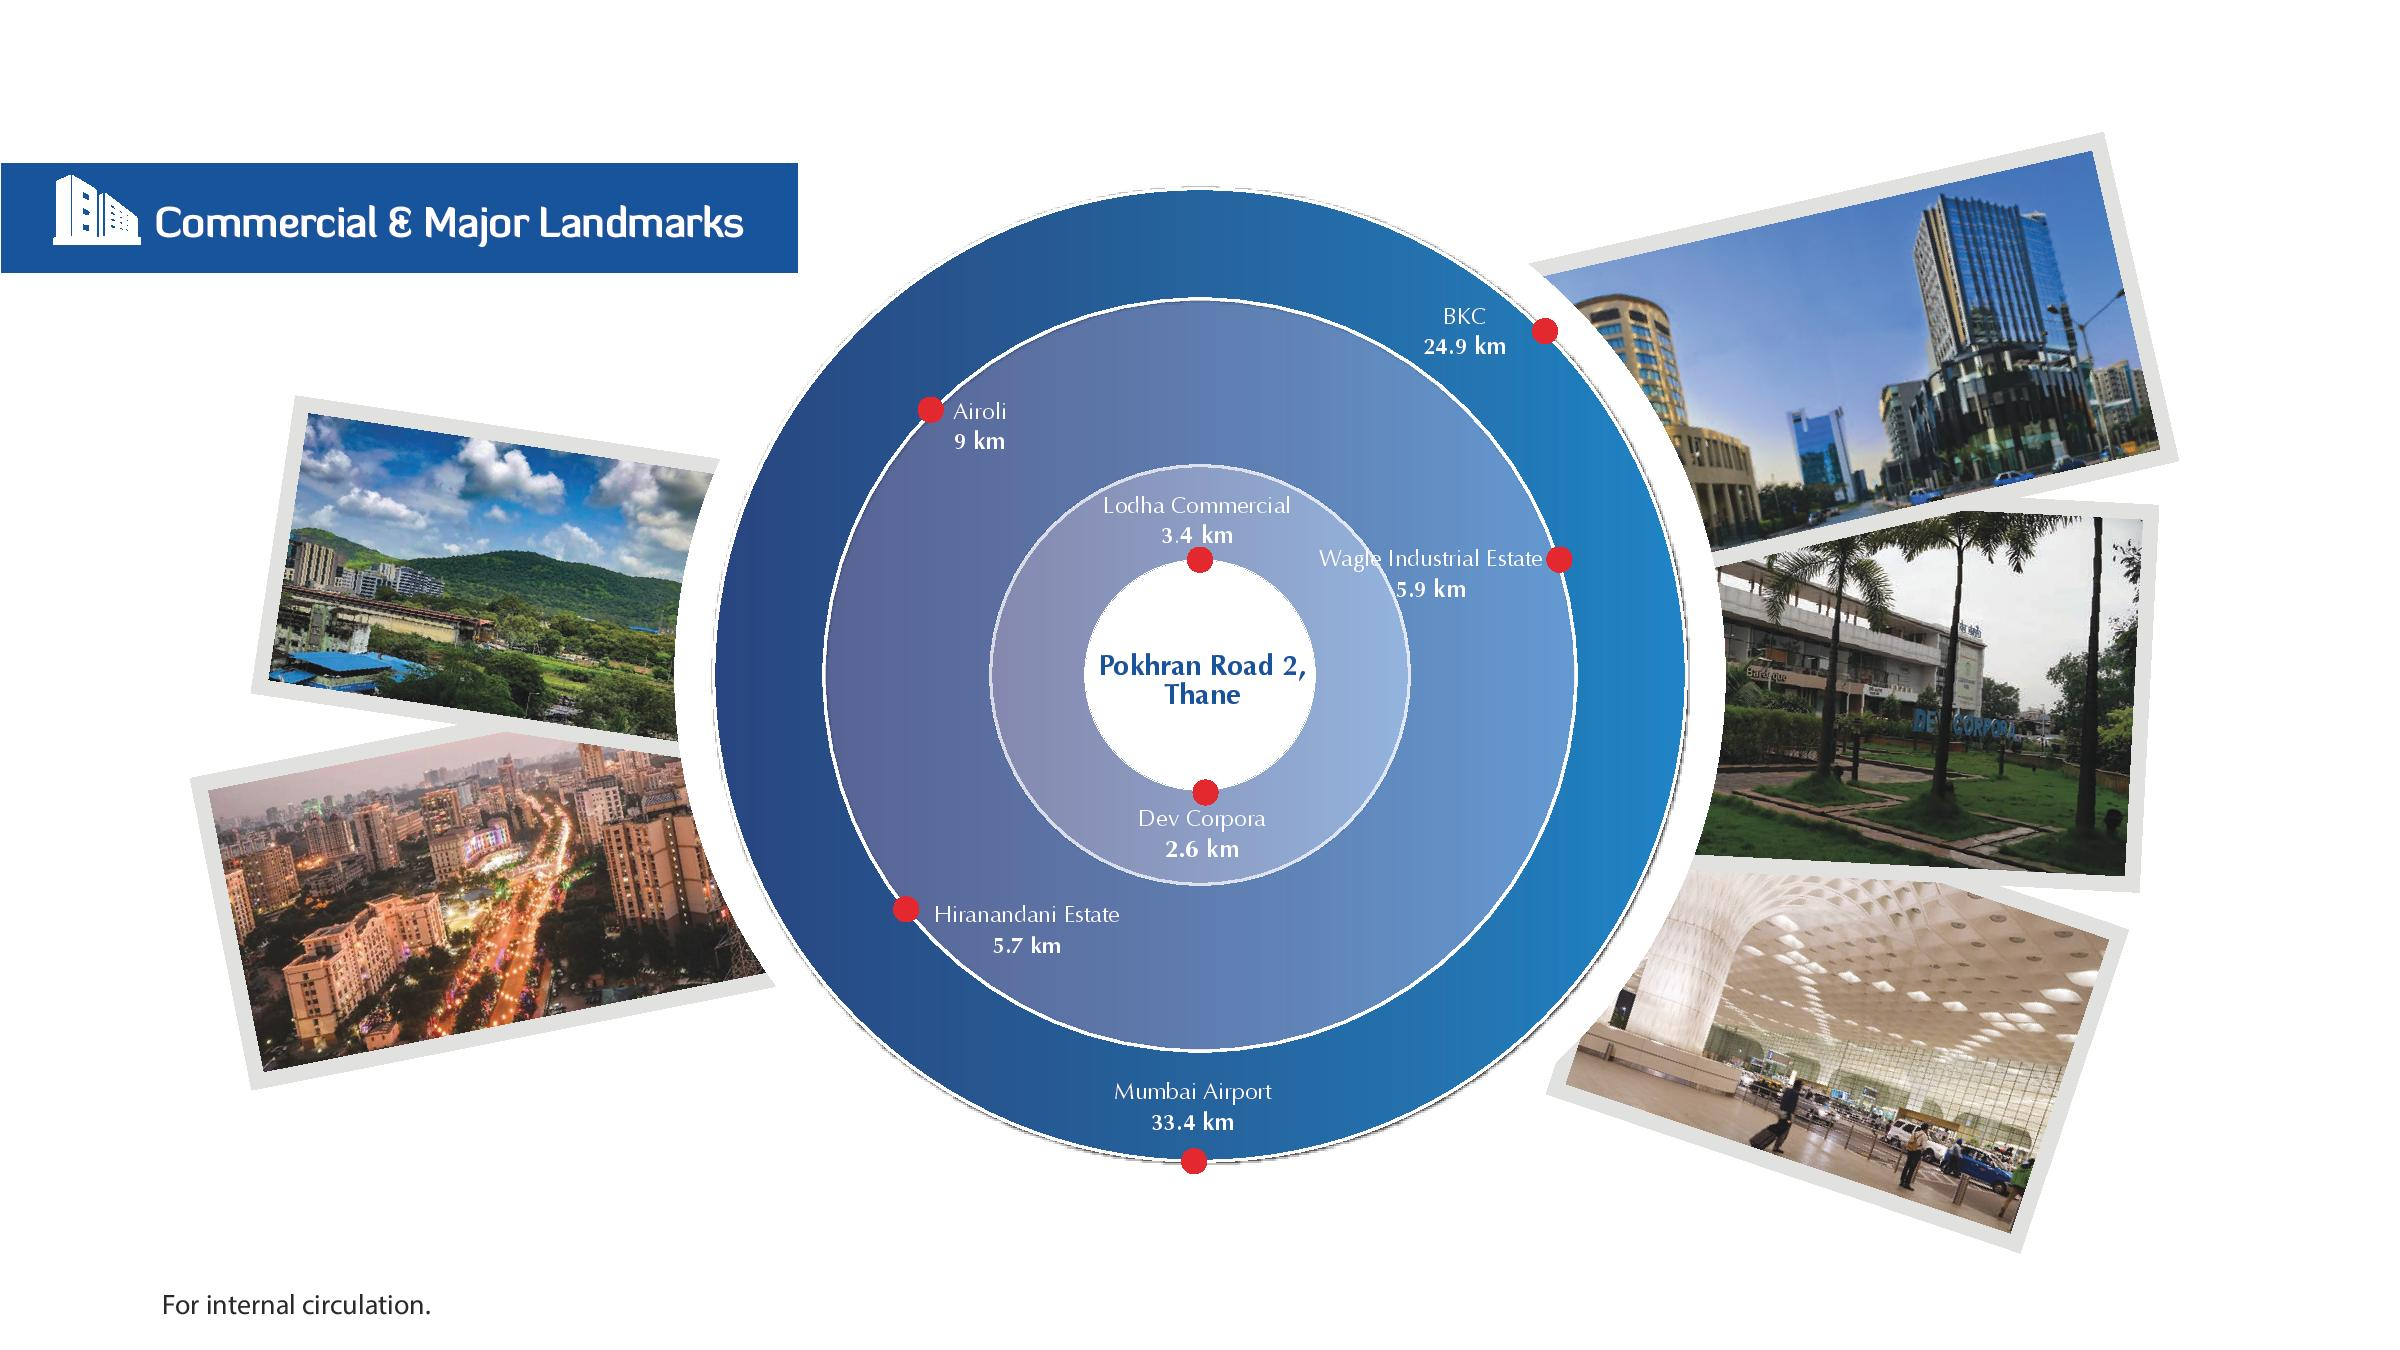 Commercial & Major Land Mark